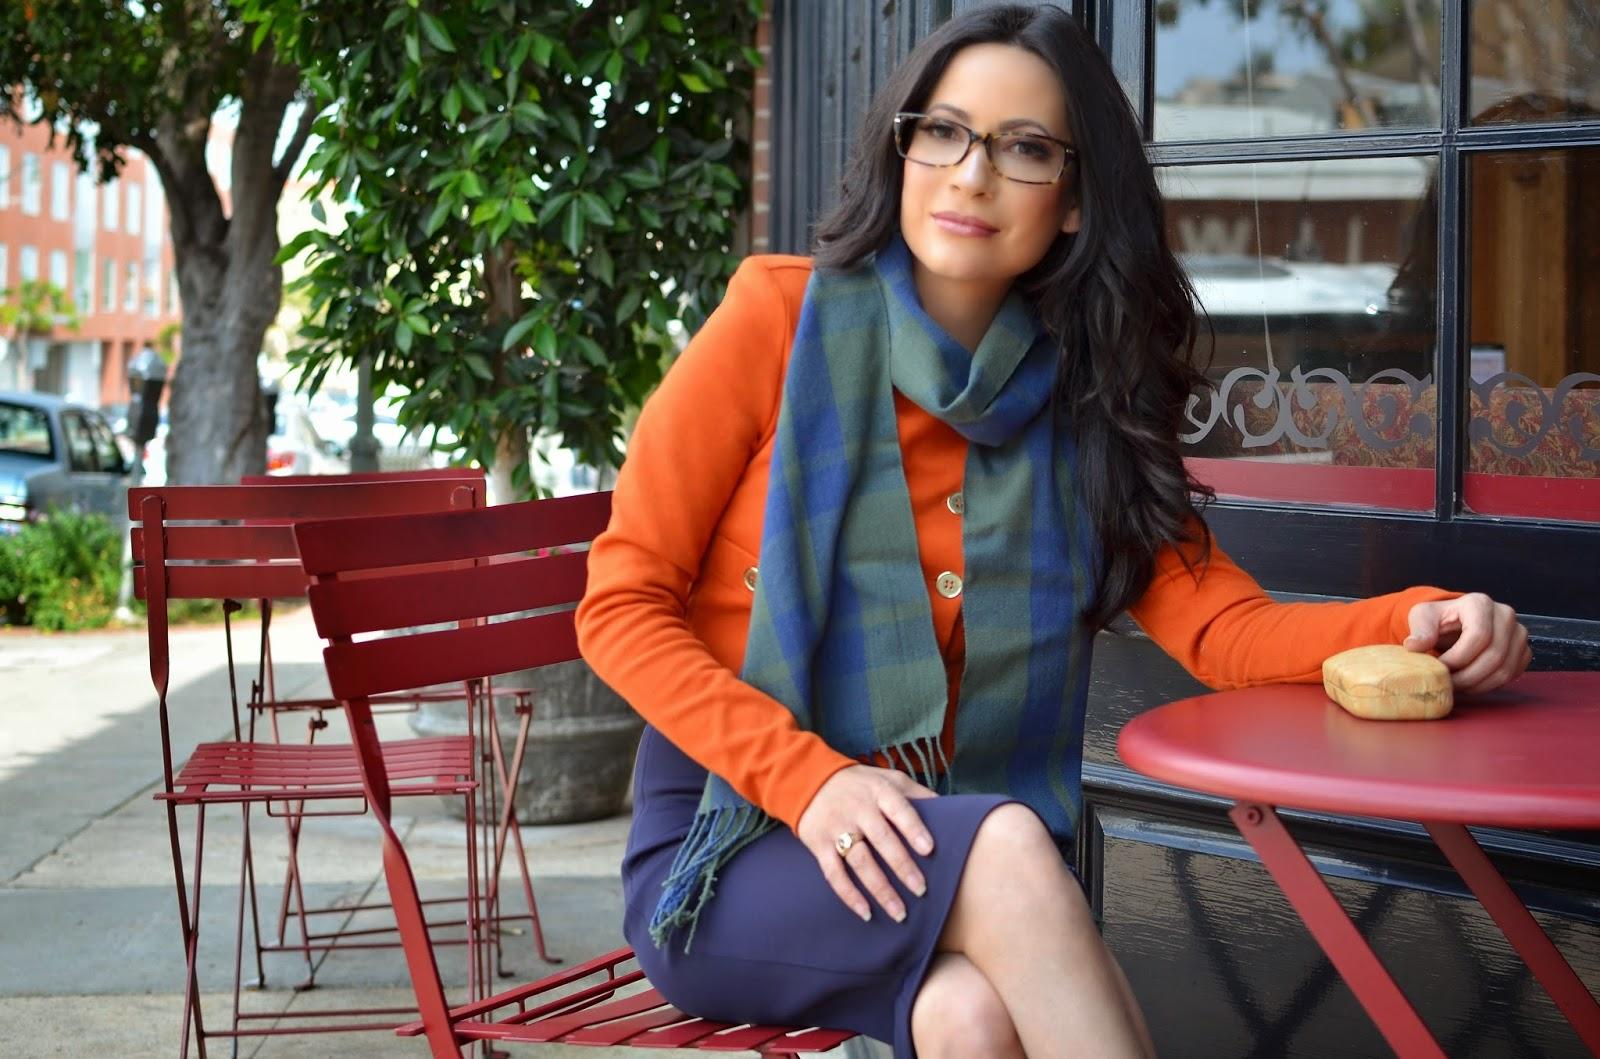 2117a49a538 Firmoo Eyewear Firmoo.com Global Online Optical Store Orange H M Jacket  Armani Exchage Navy Blue